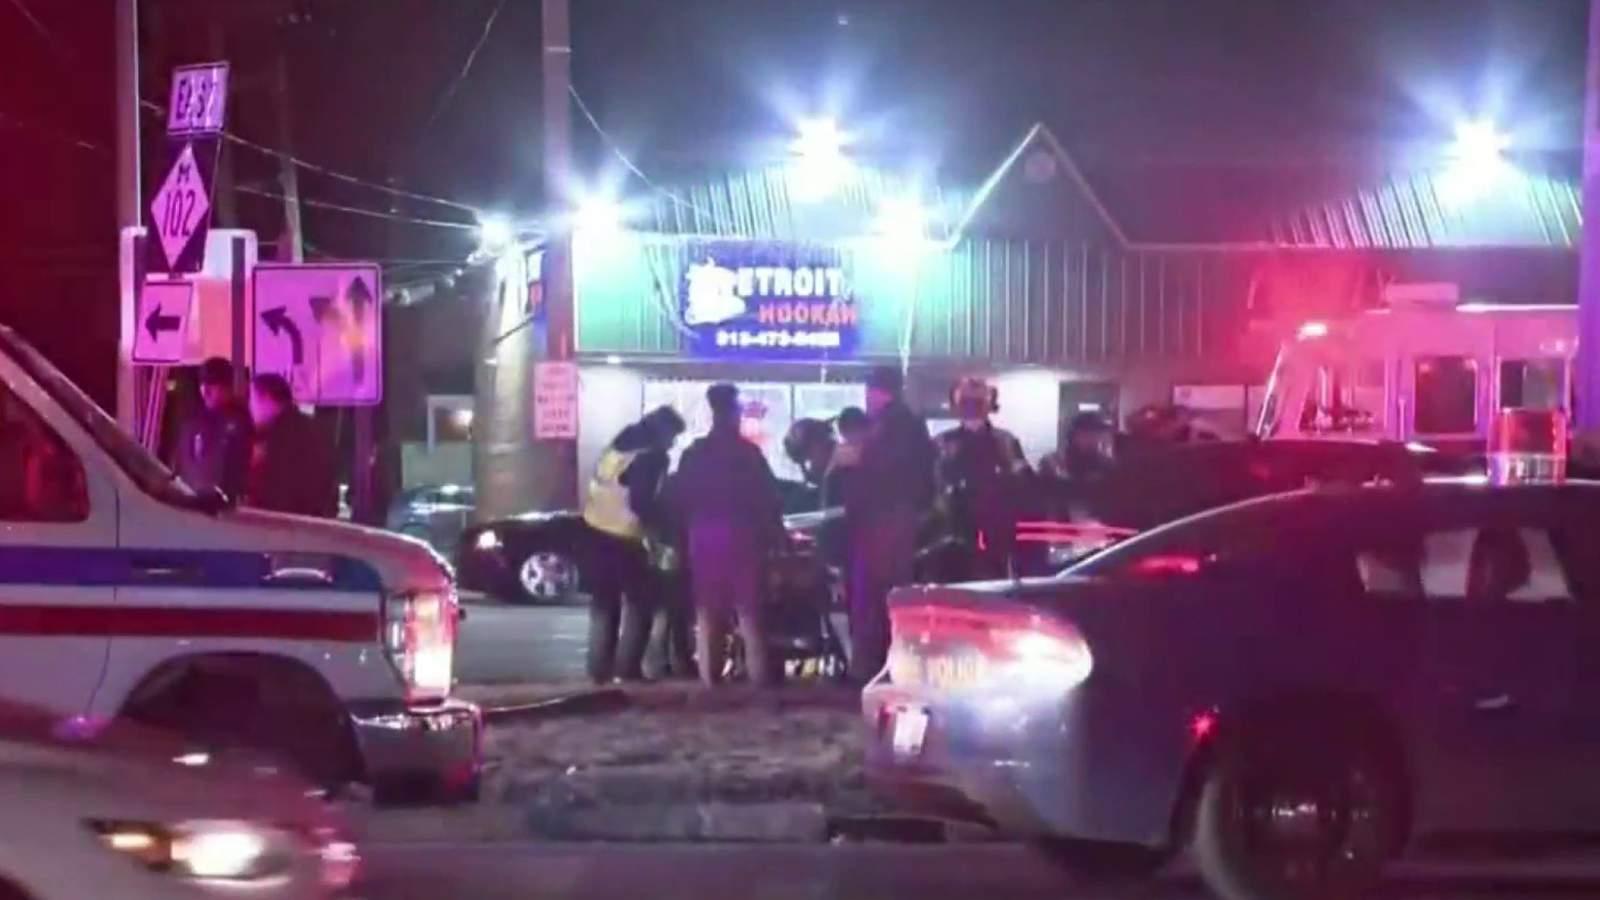 Morning Briefing Jan. 23, 2021: 2 women fatally shot in Clinton Township, $1 billion Mega Millions lottery ticket sold at Novi Kroger, broadcasting giant Larry King dies